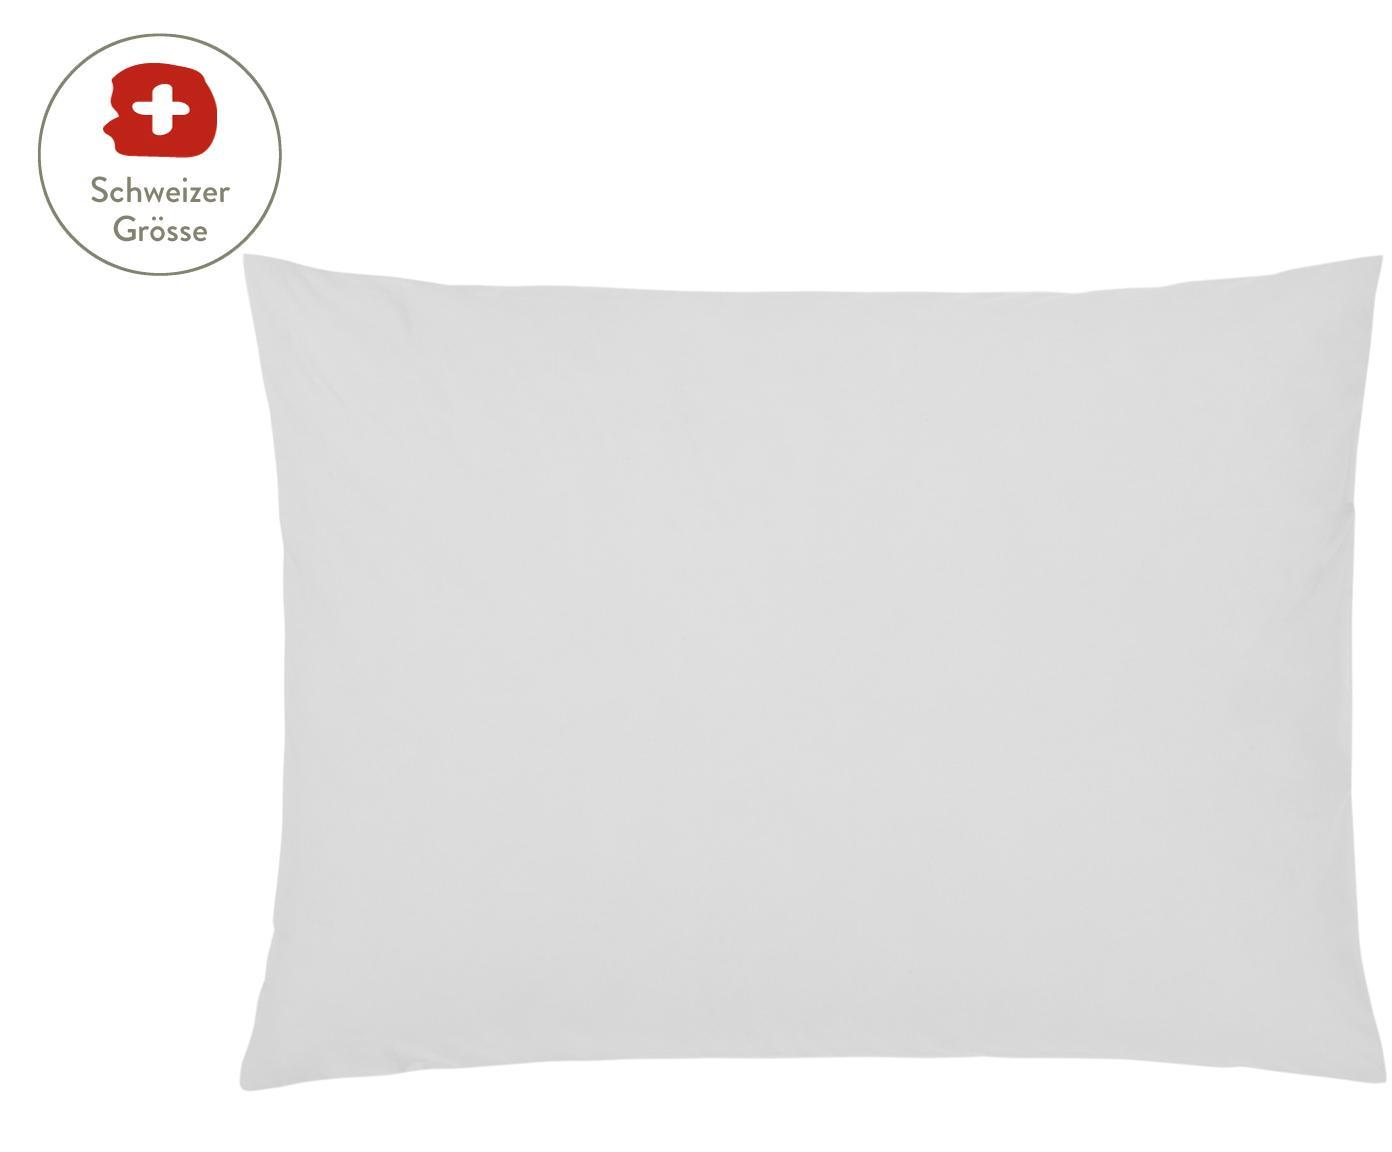 Baumwollperkal-Kissenbezug Elsie in Hellgrau, Webart: Perkal Fadendichte 200 TC, Hellgrau, 50 x 70 cm